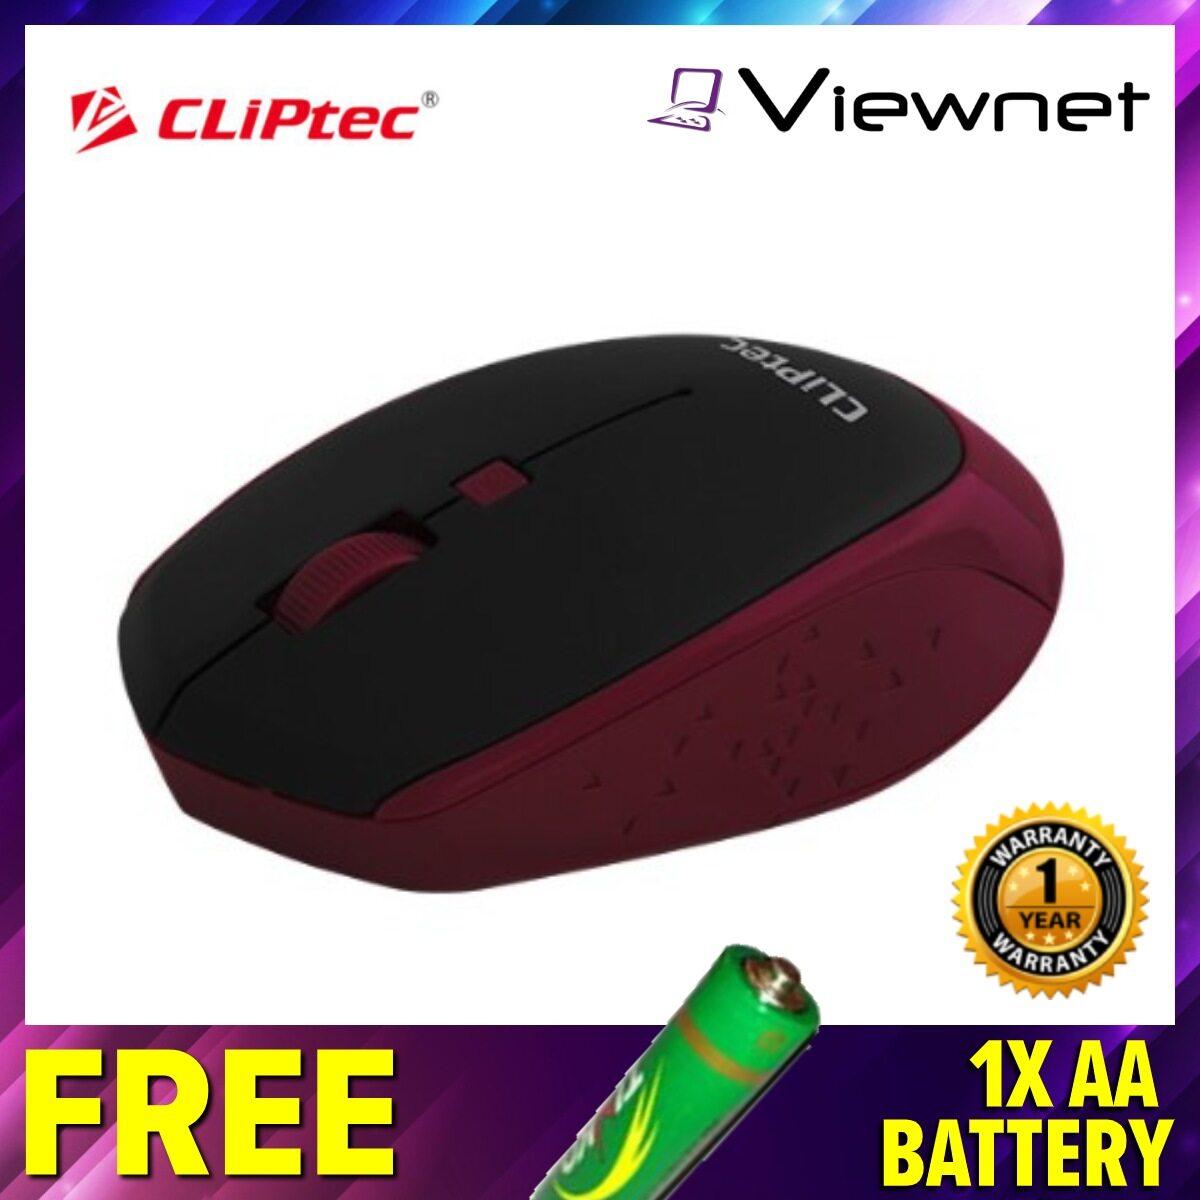 Cliptec Wireless Optical Mouse (RZS-857), 1600 dpi, 2.4GHz, Mini Nano Receiver, Black / Grey / Maroon